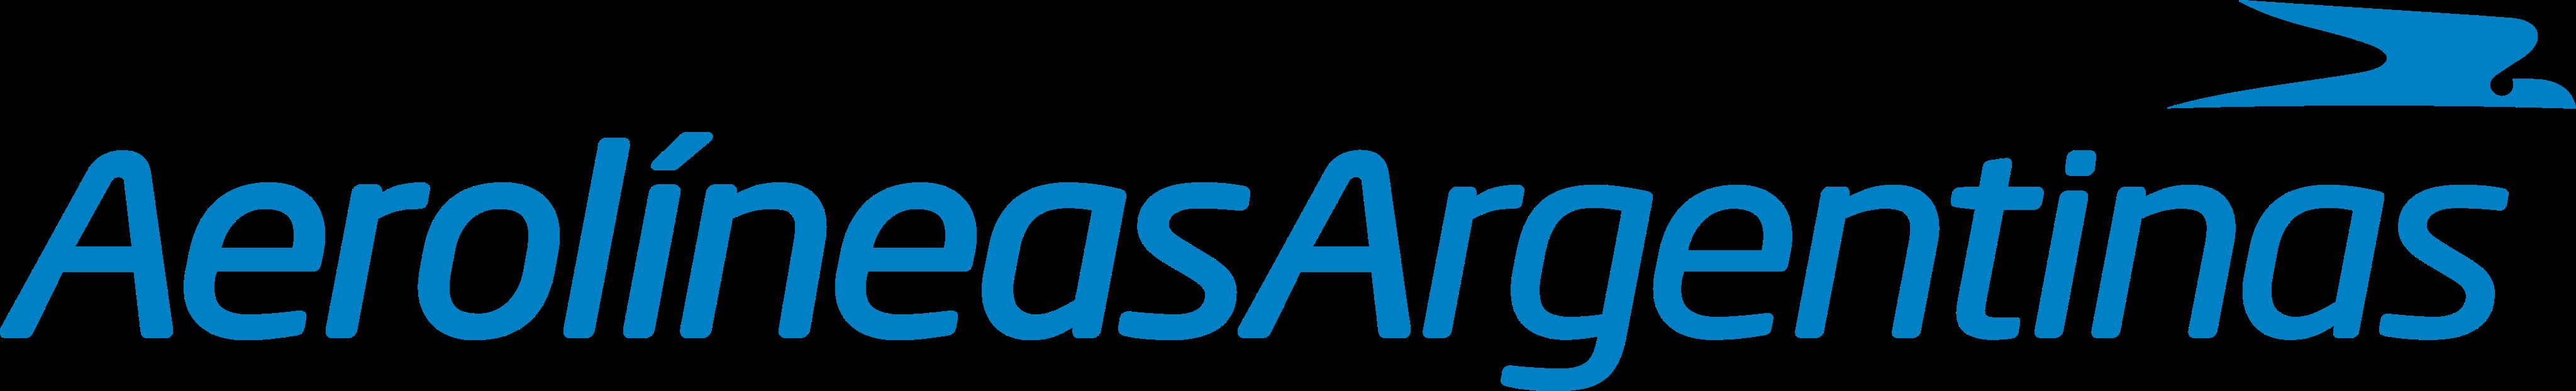 aero-lineas-argentinas-logo